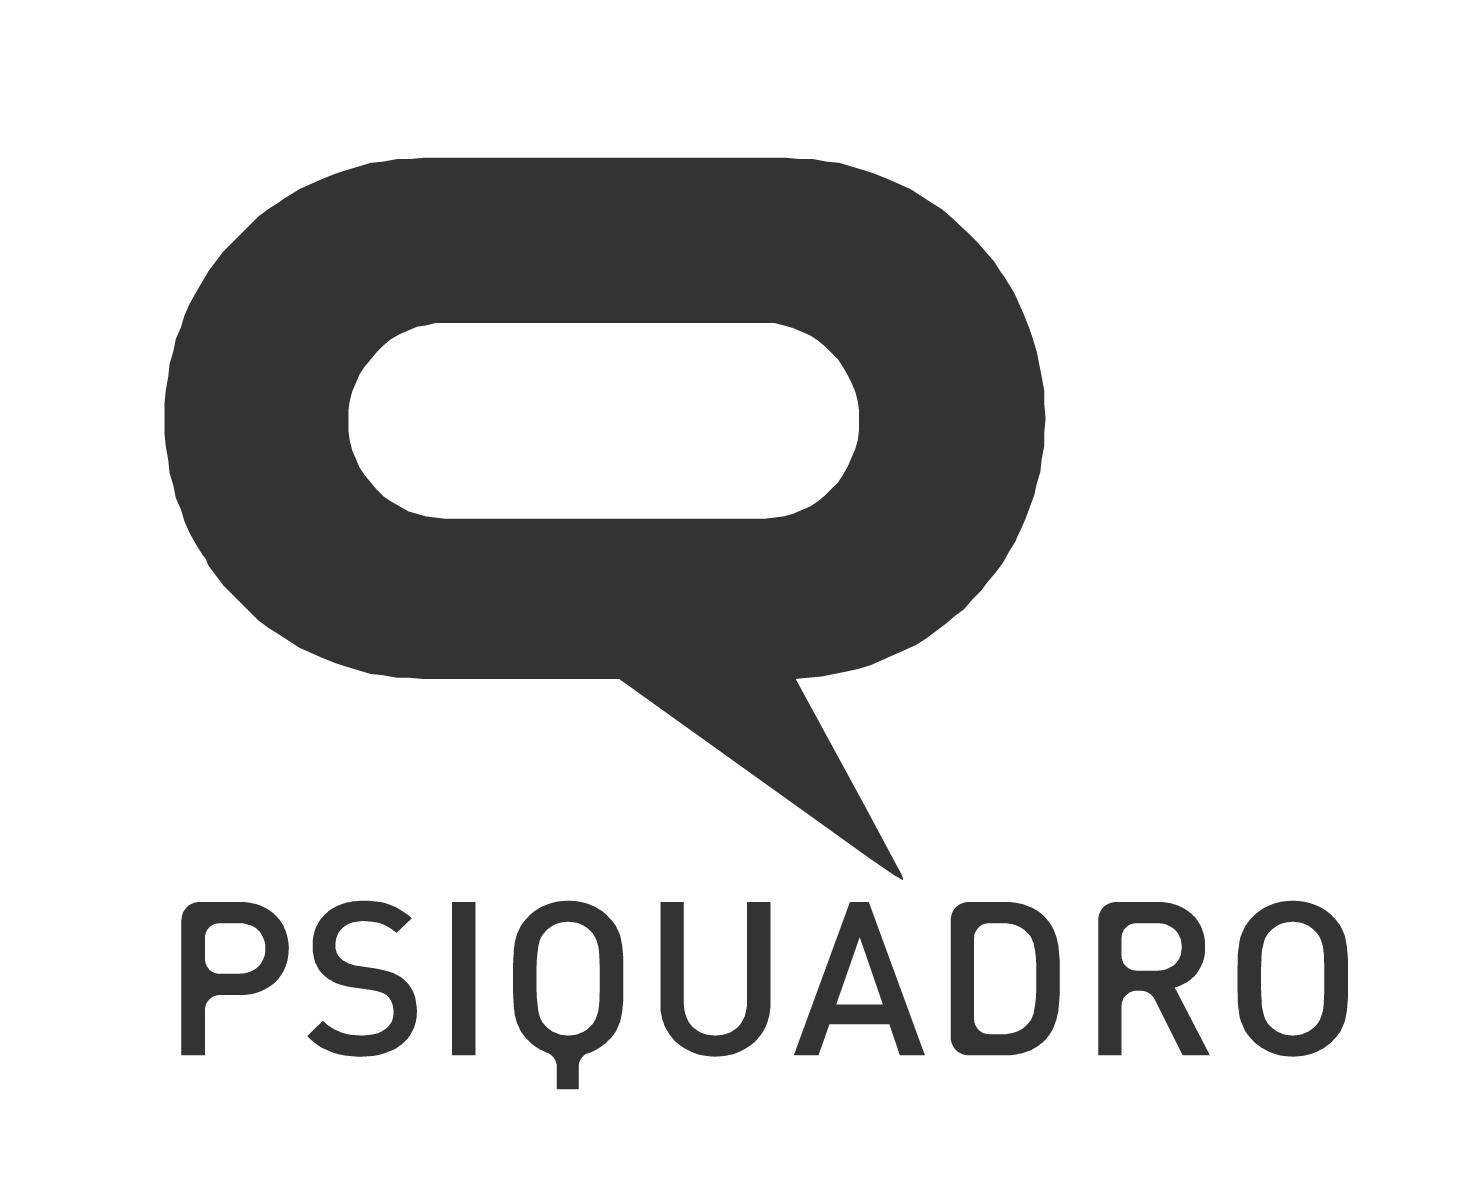 Psiquadro b/n